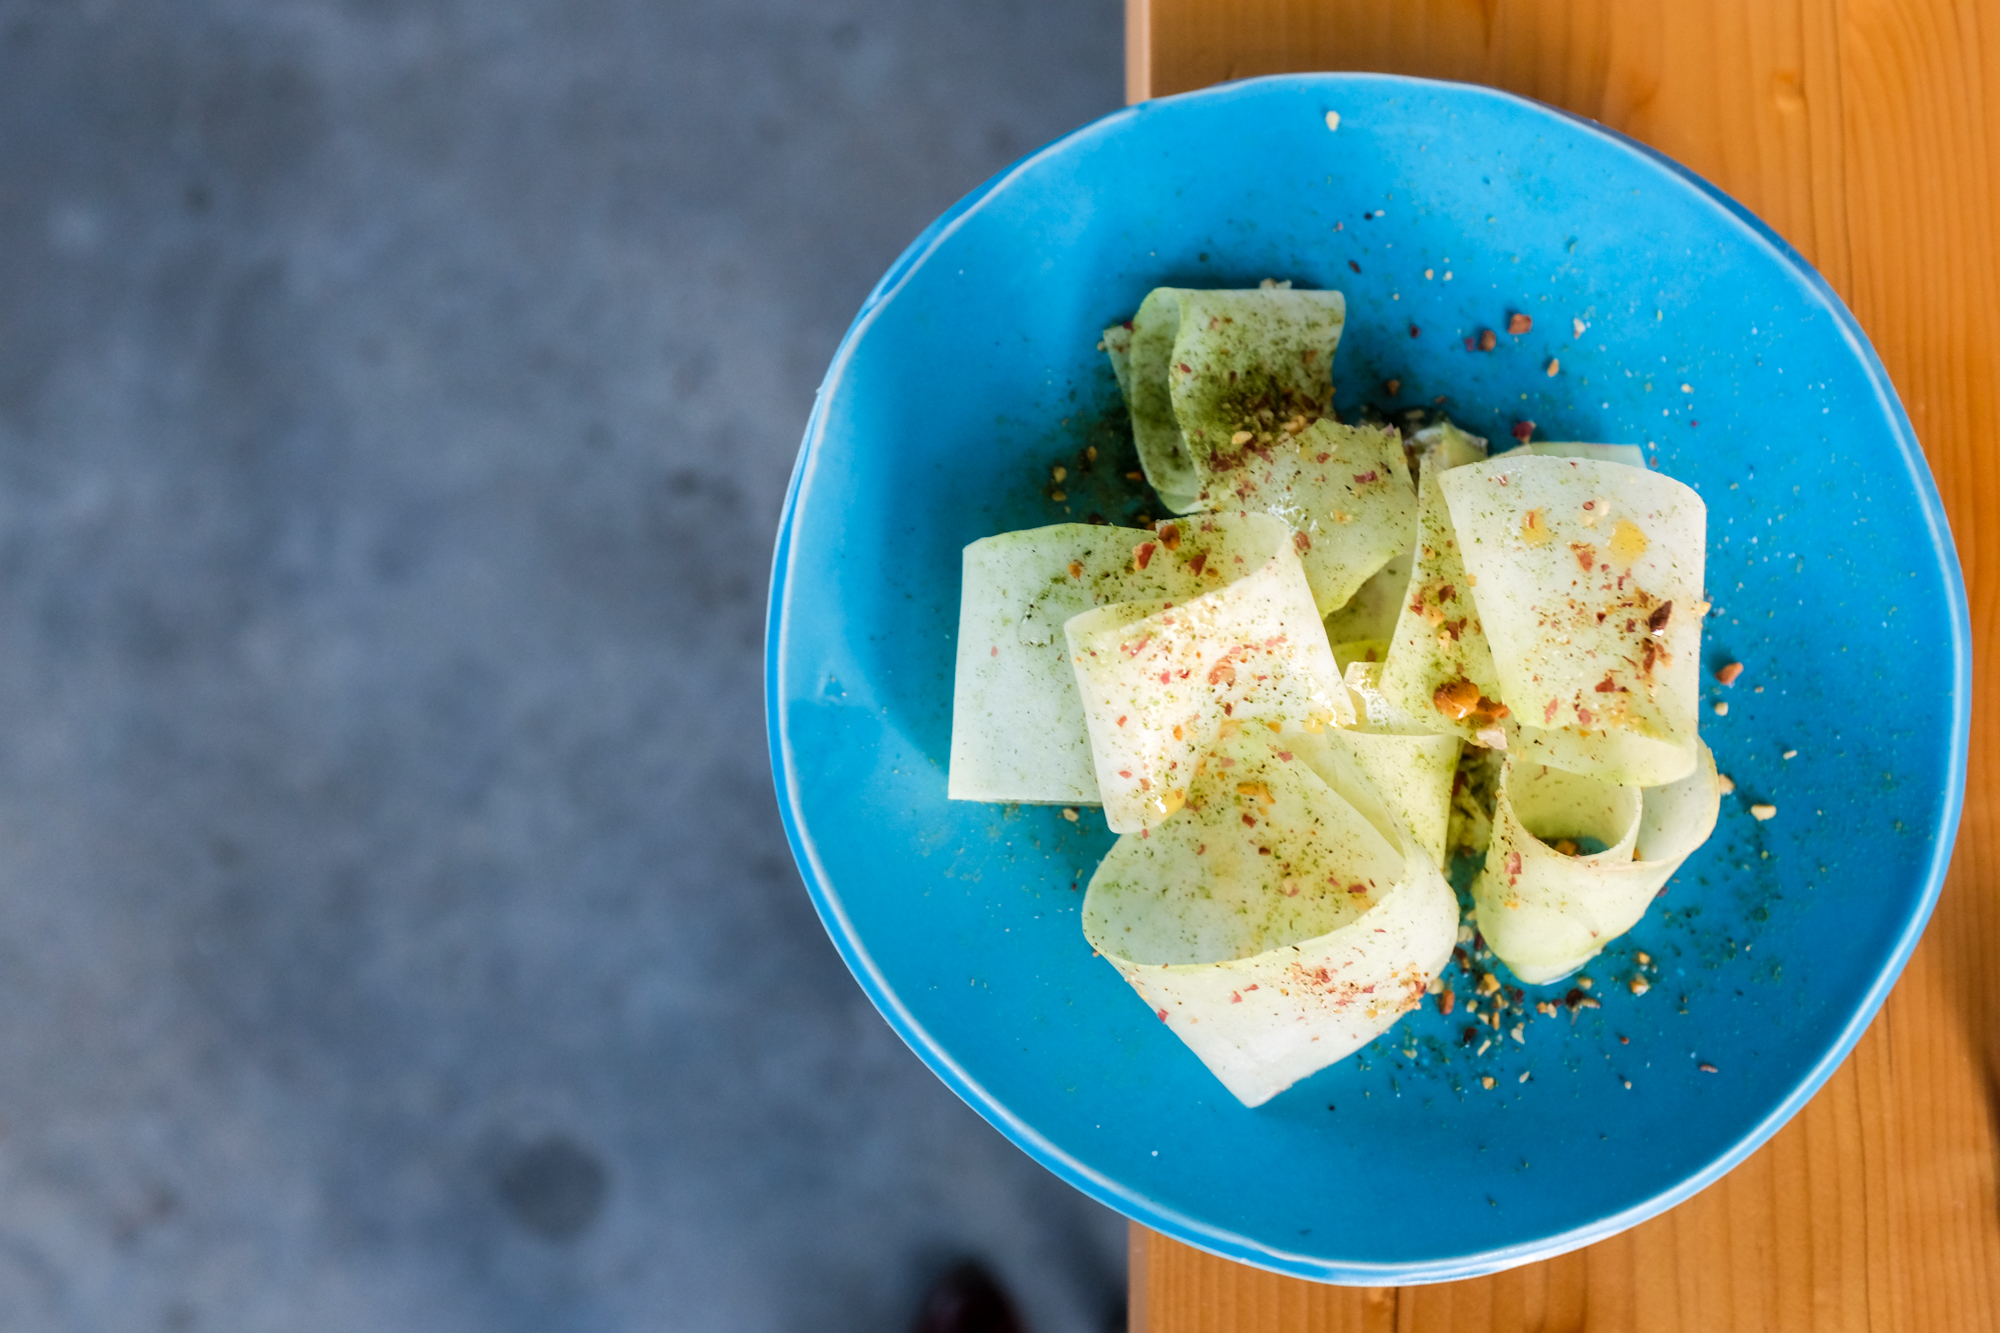 Top Austin Restaurant Loses One of Its Original Chefs